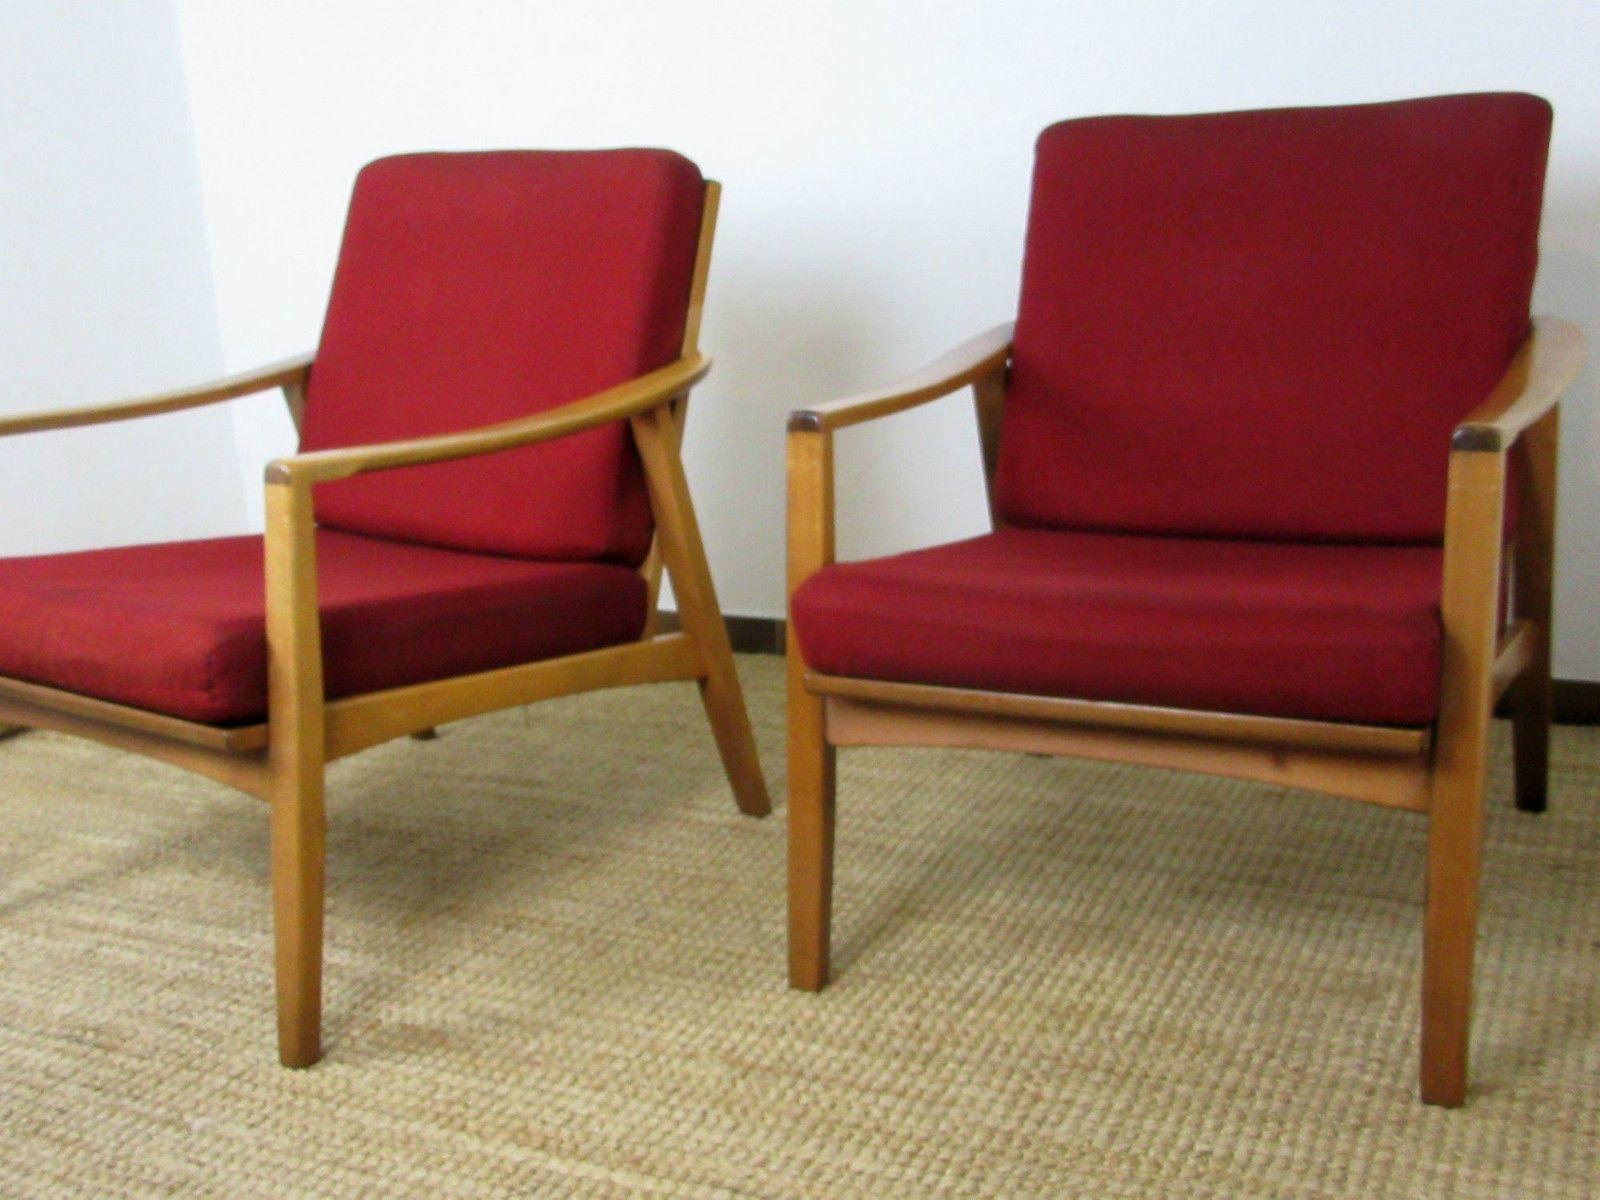 2 x sessel mid century danish design lounge club easy chair 50er 60er teak ebay easy. Black Bedroom Furniture Sets. Home Design Ideas